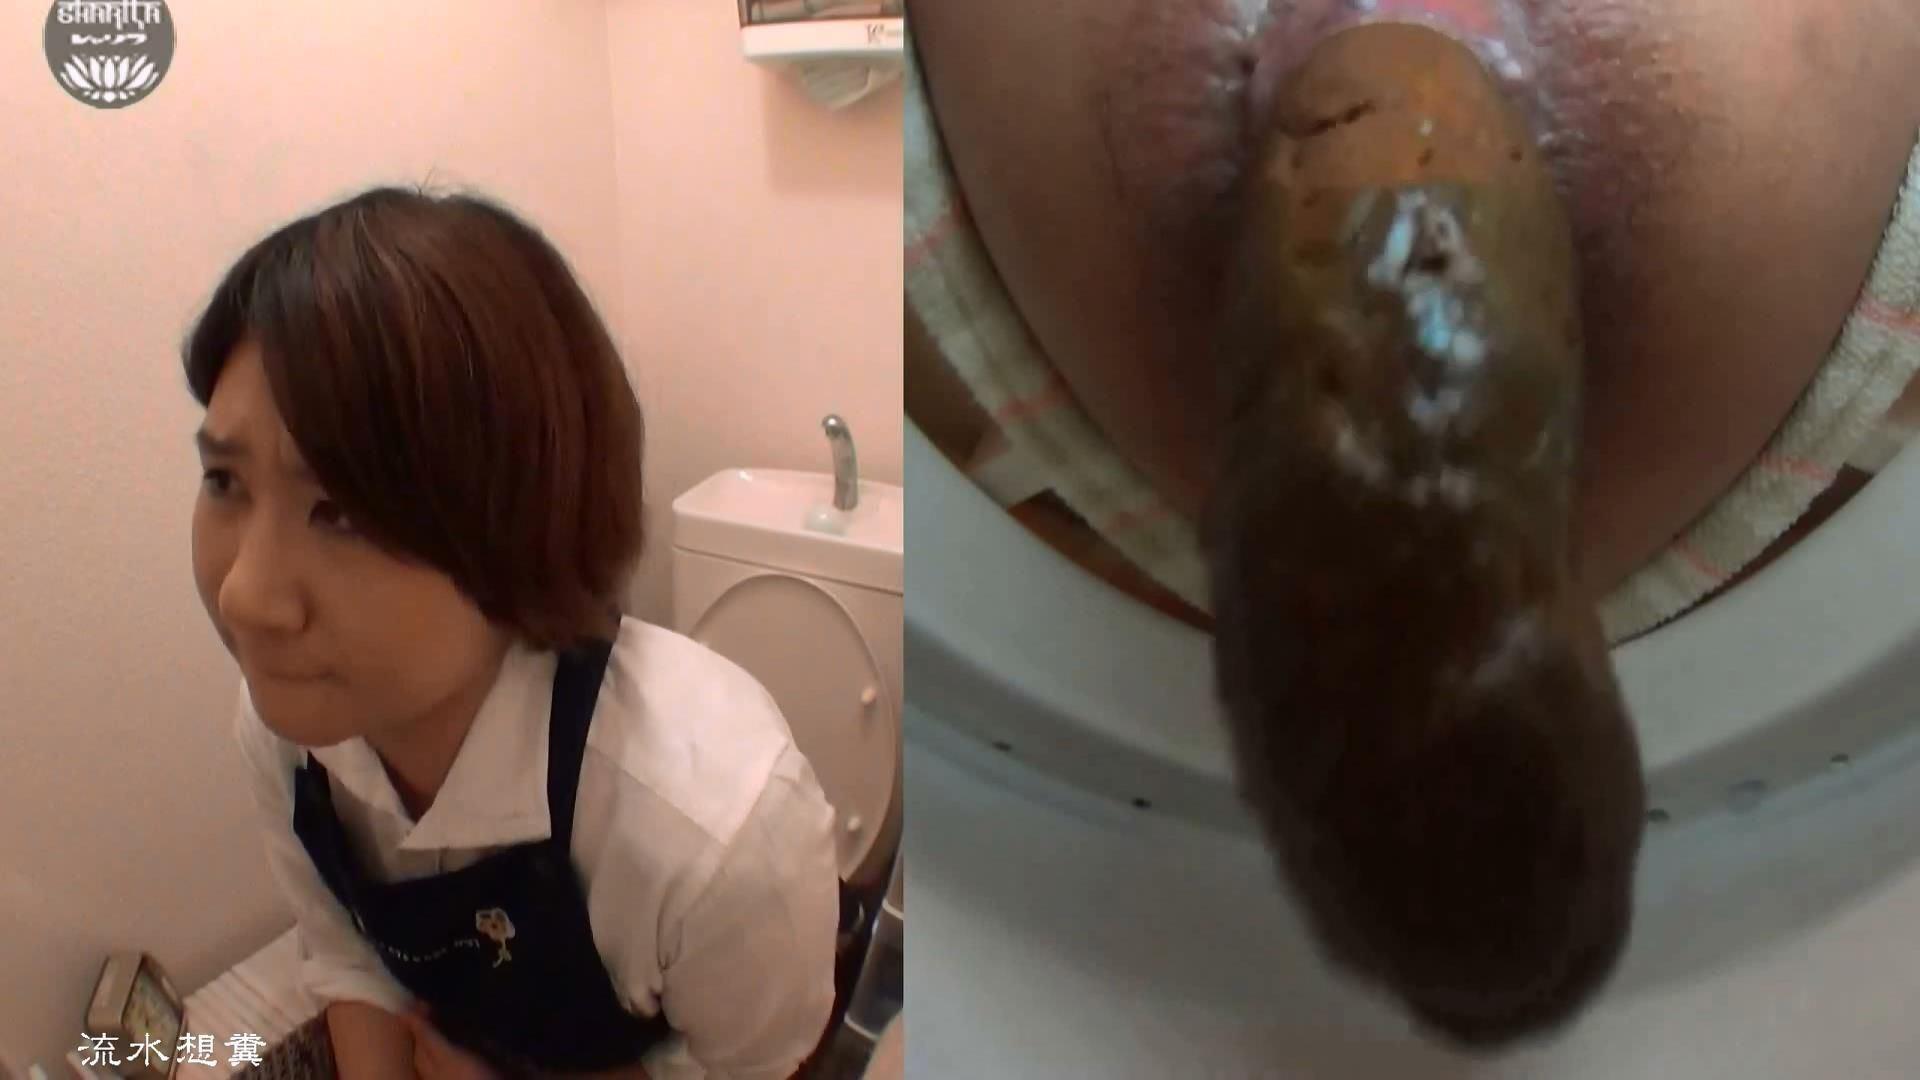 Cam japanese shitting video voyeur woman porn clips